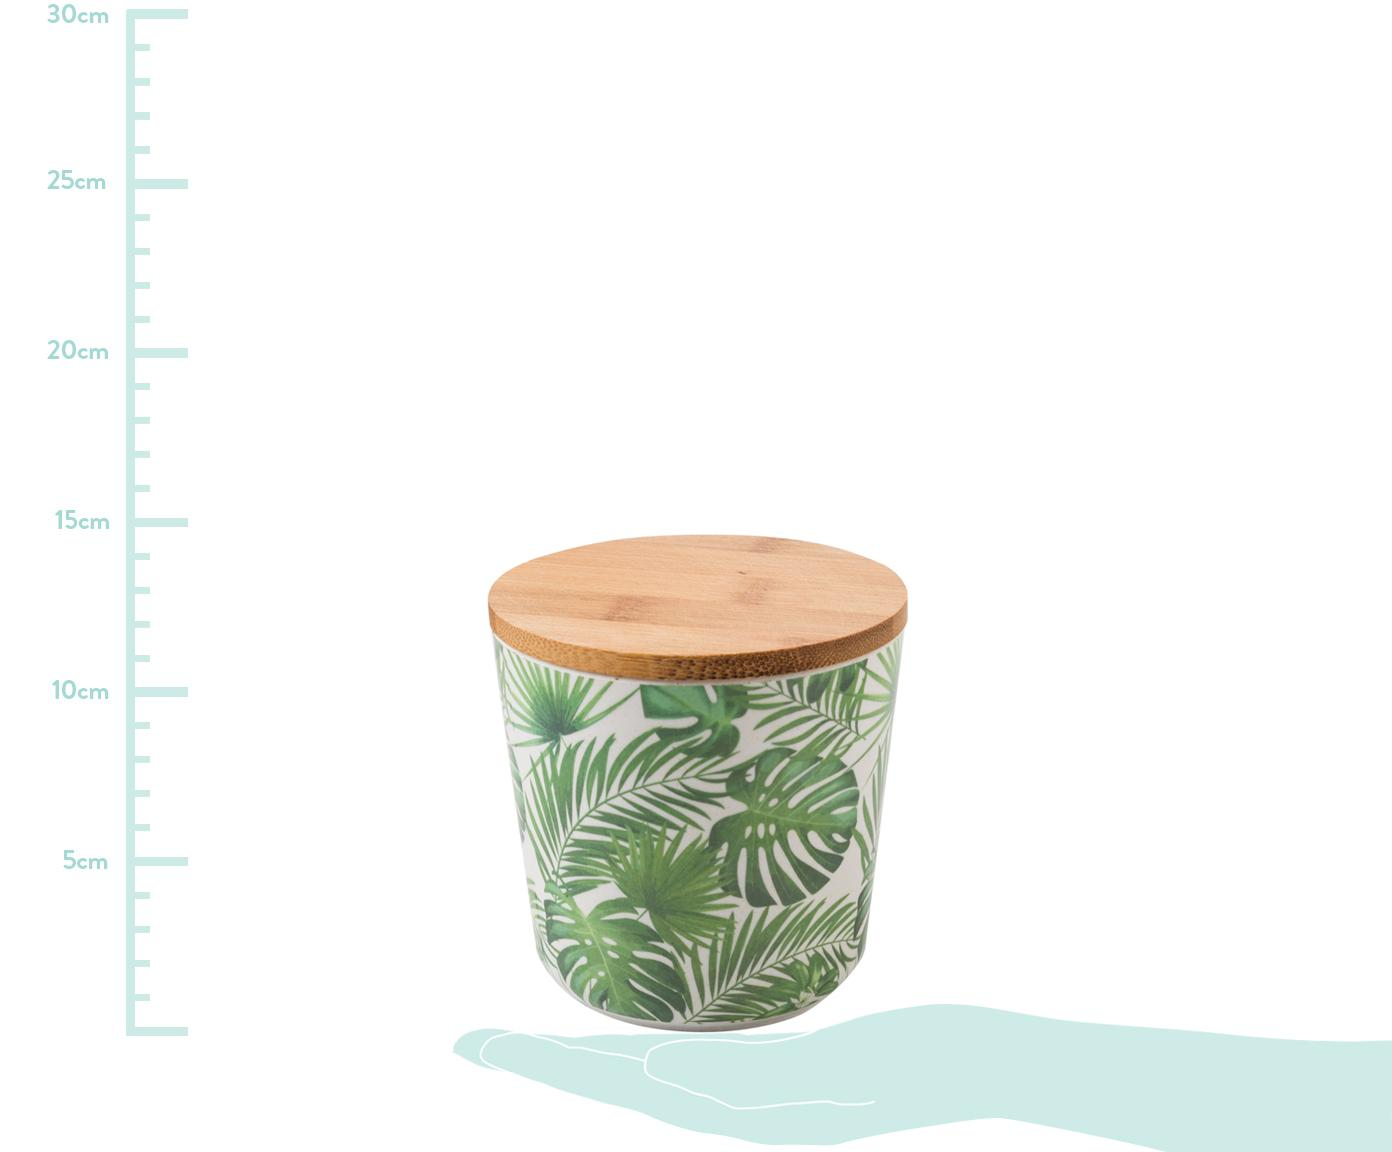 Aufbewahrungsdosen-Set Tropical, 2-tlg., Deckel: Bambusholz, Kunststoff, Grüntöne, Weiß, Ø 11 x H 11 cm